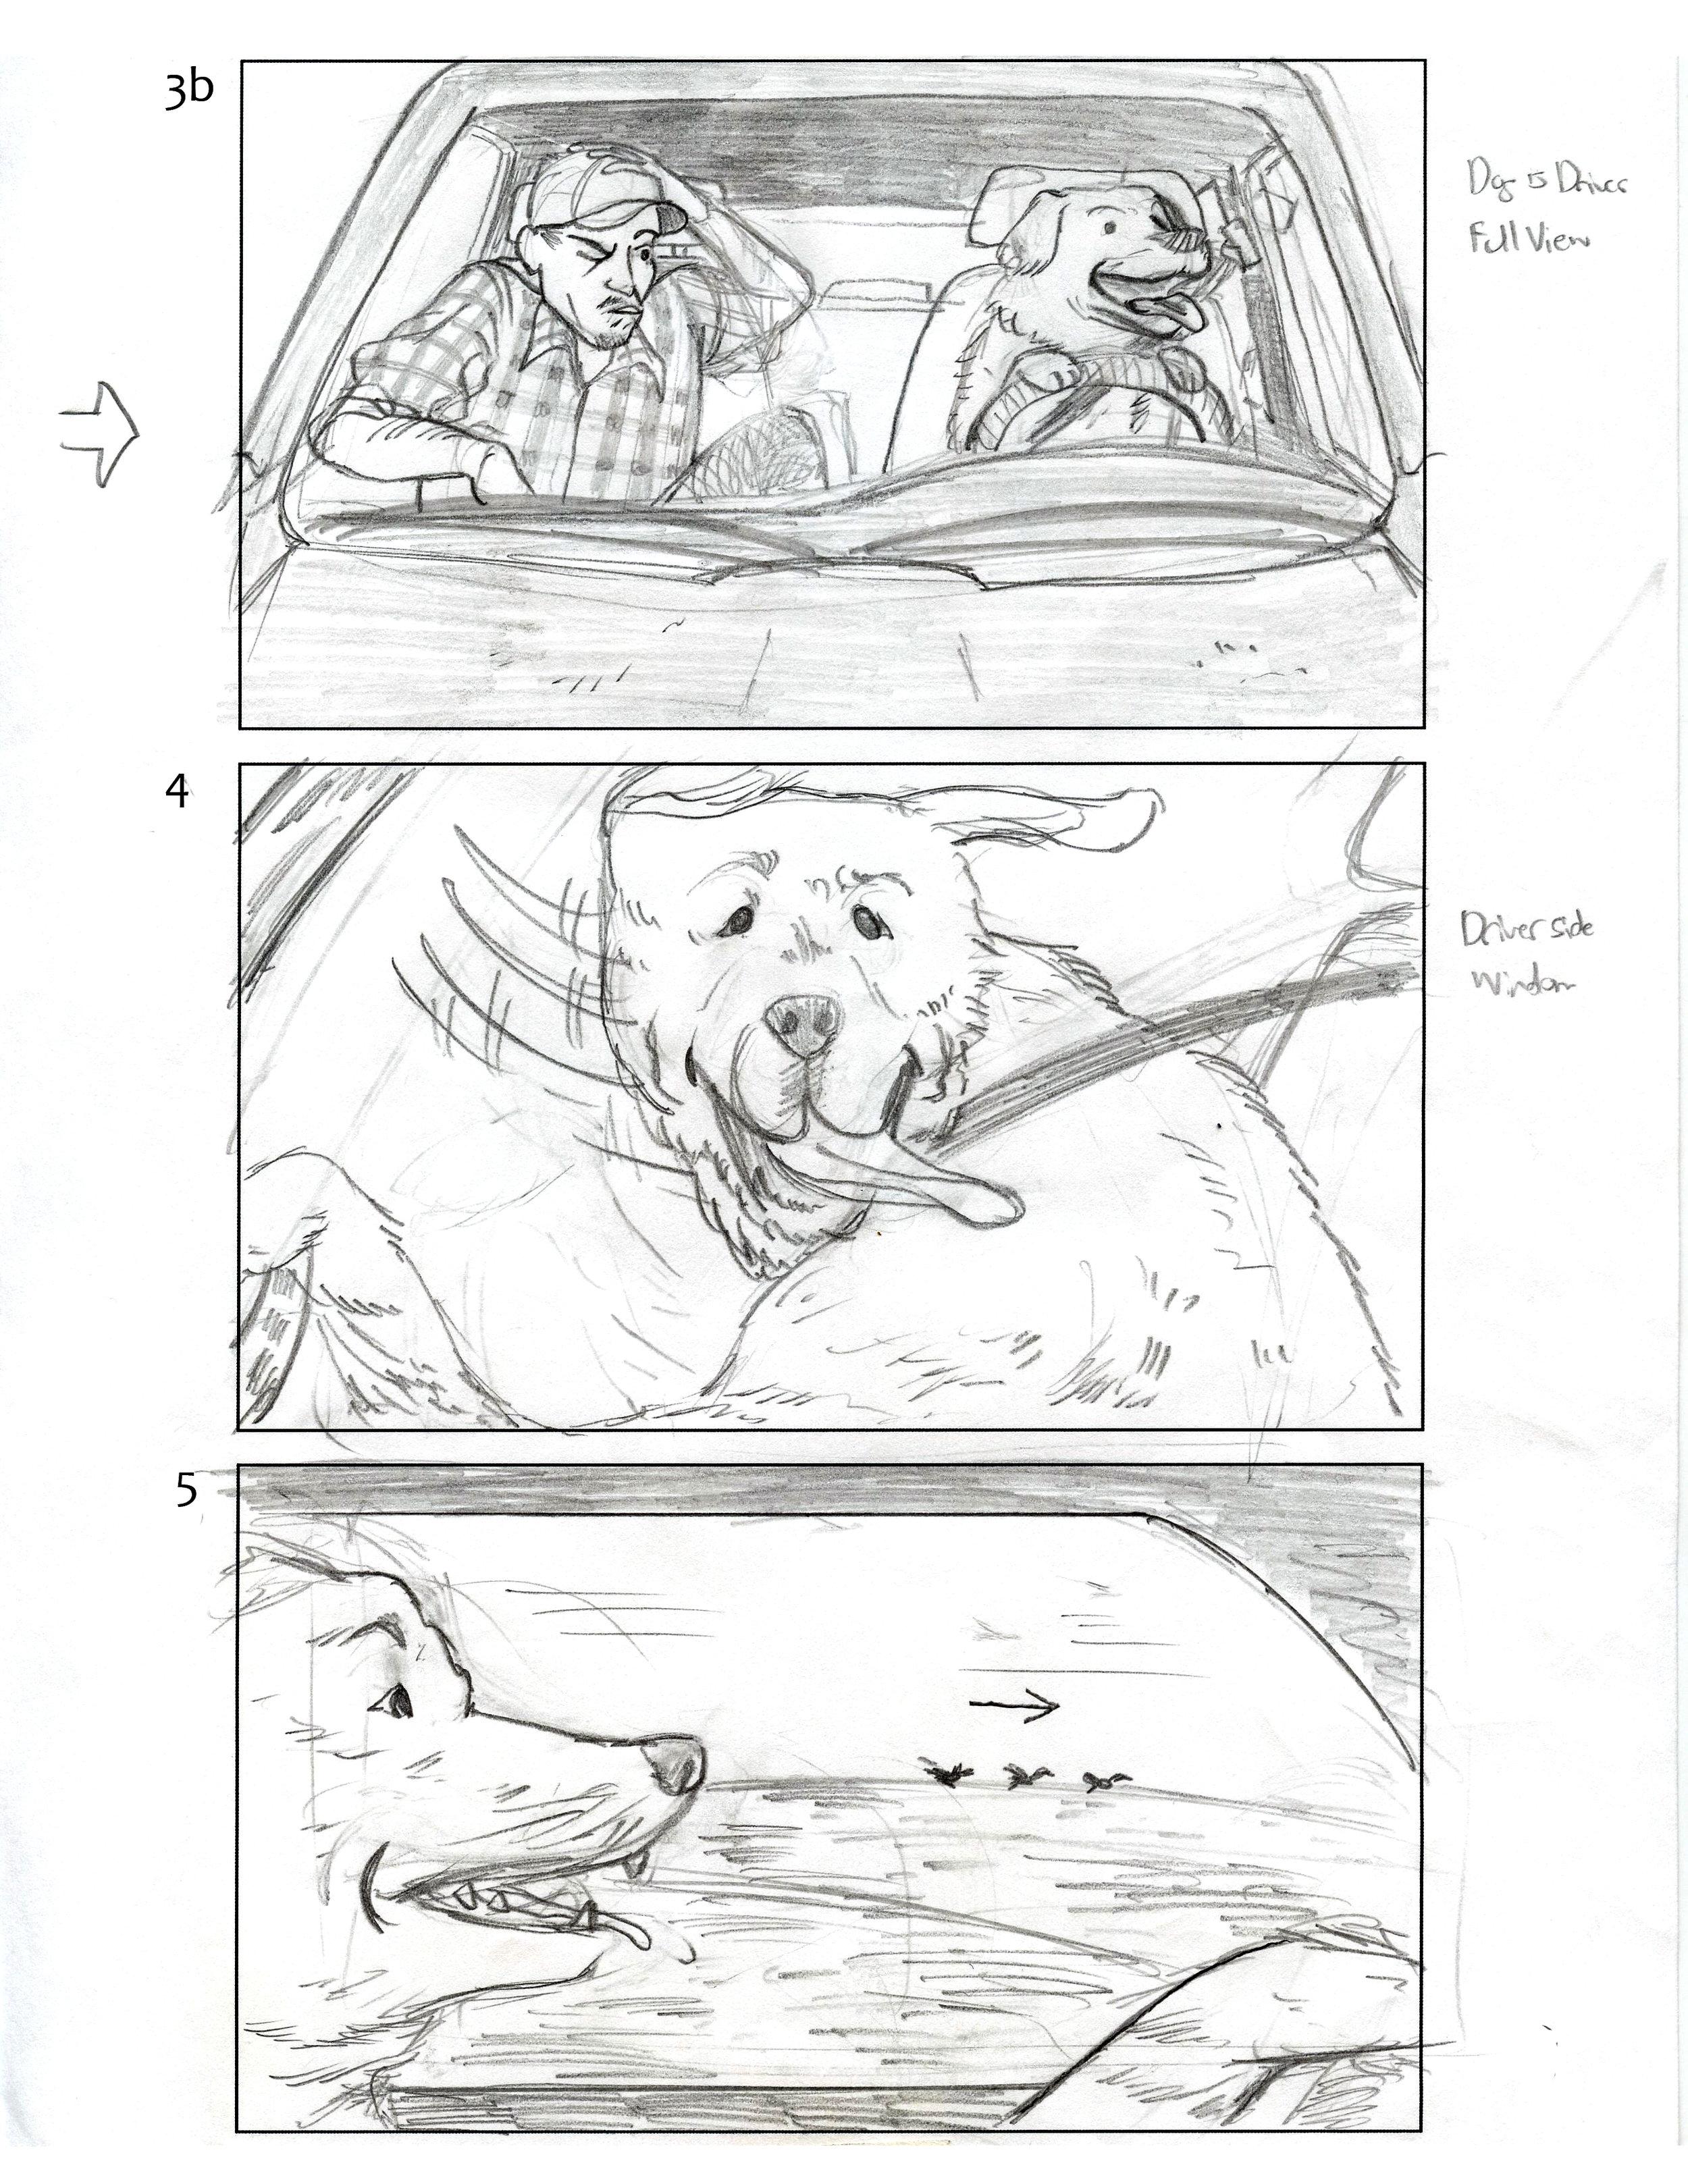 Storyboard2_3b-5.jpg